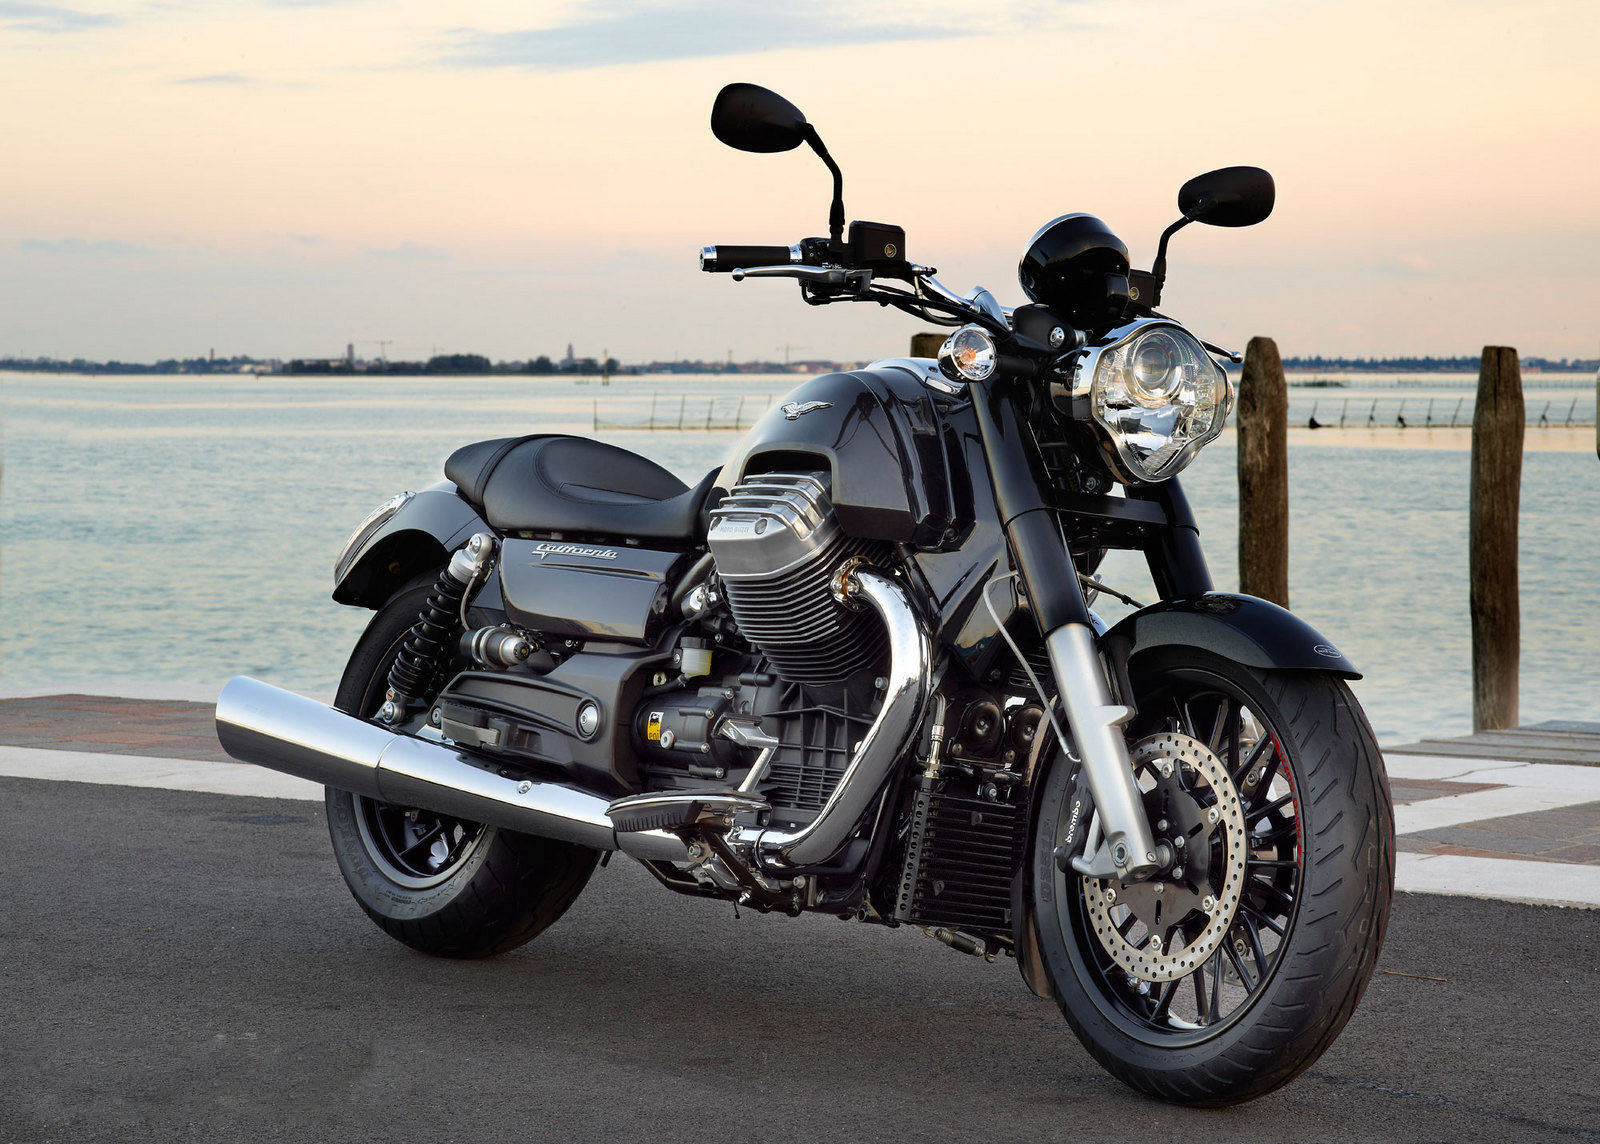 moto i 2013 Moto Guzzi Califórnia 1400 personalizado